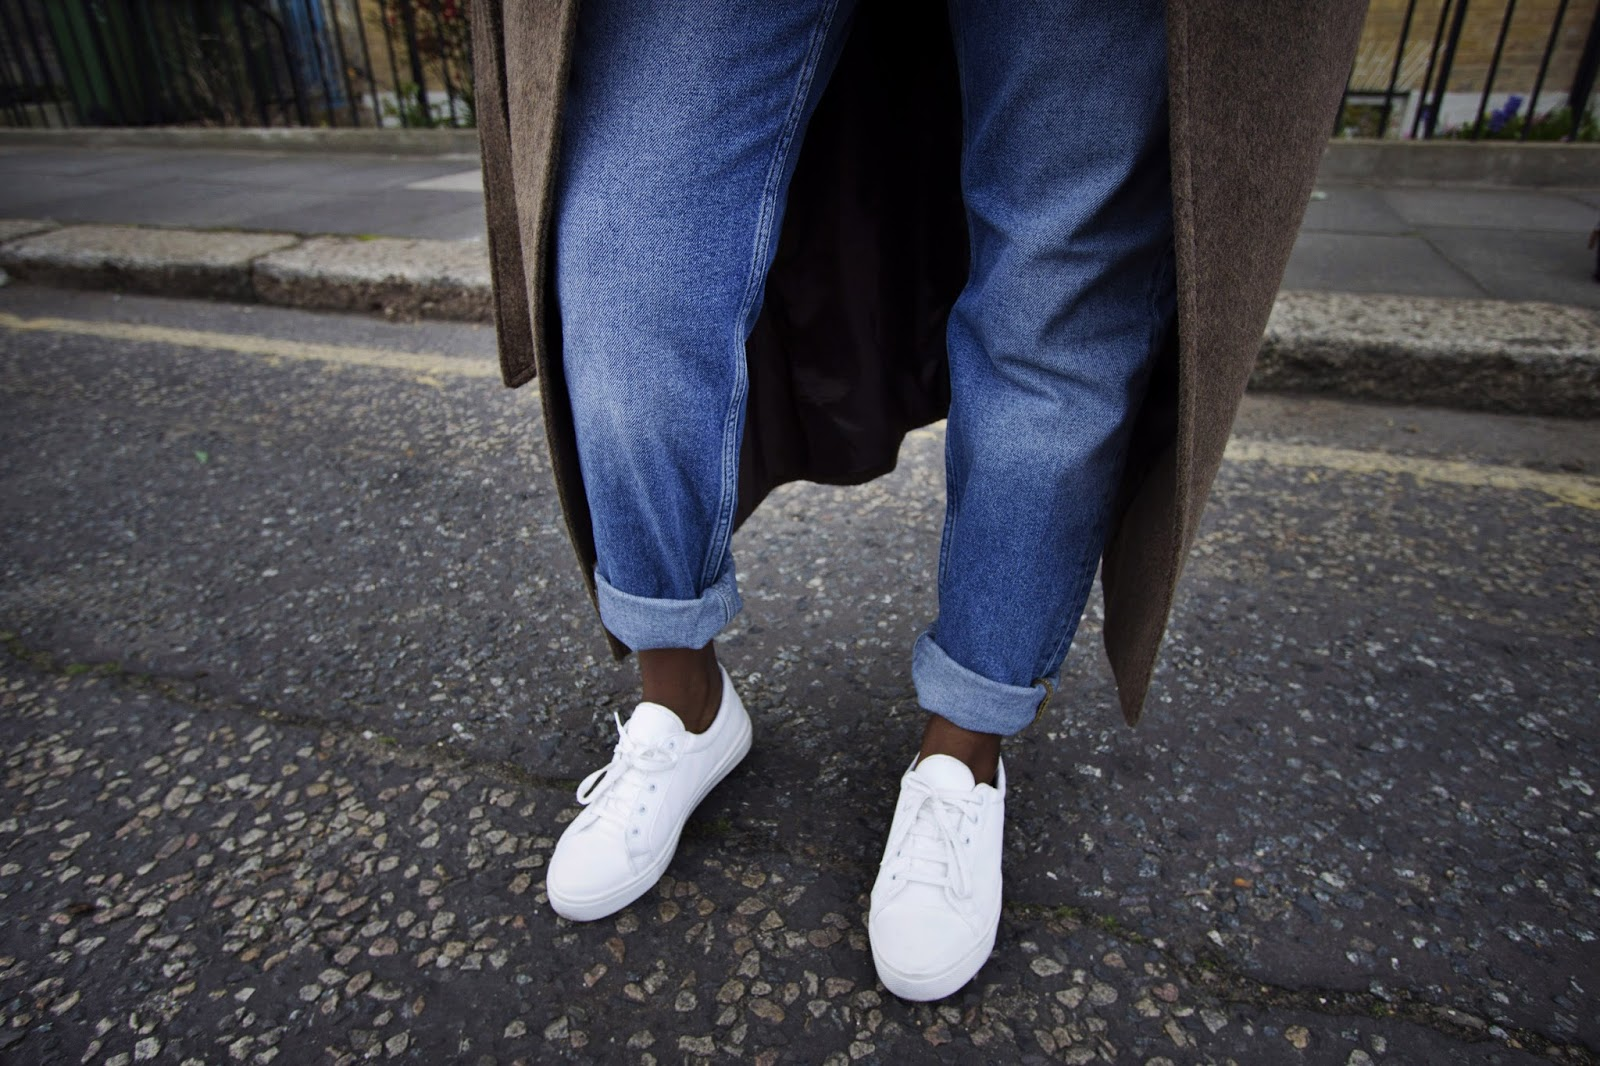 Boyfriend jeans white tennis shoes